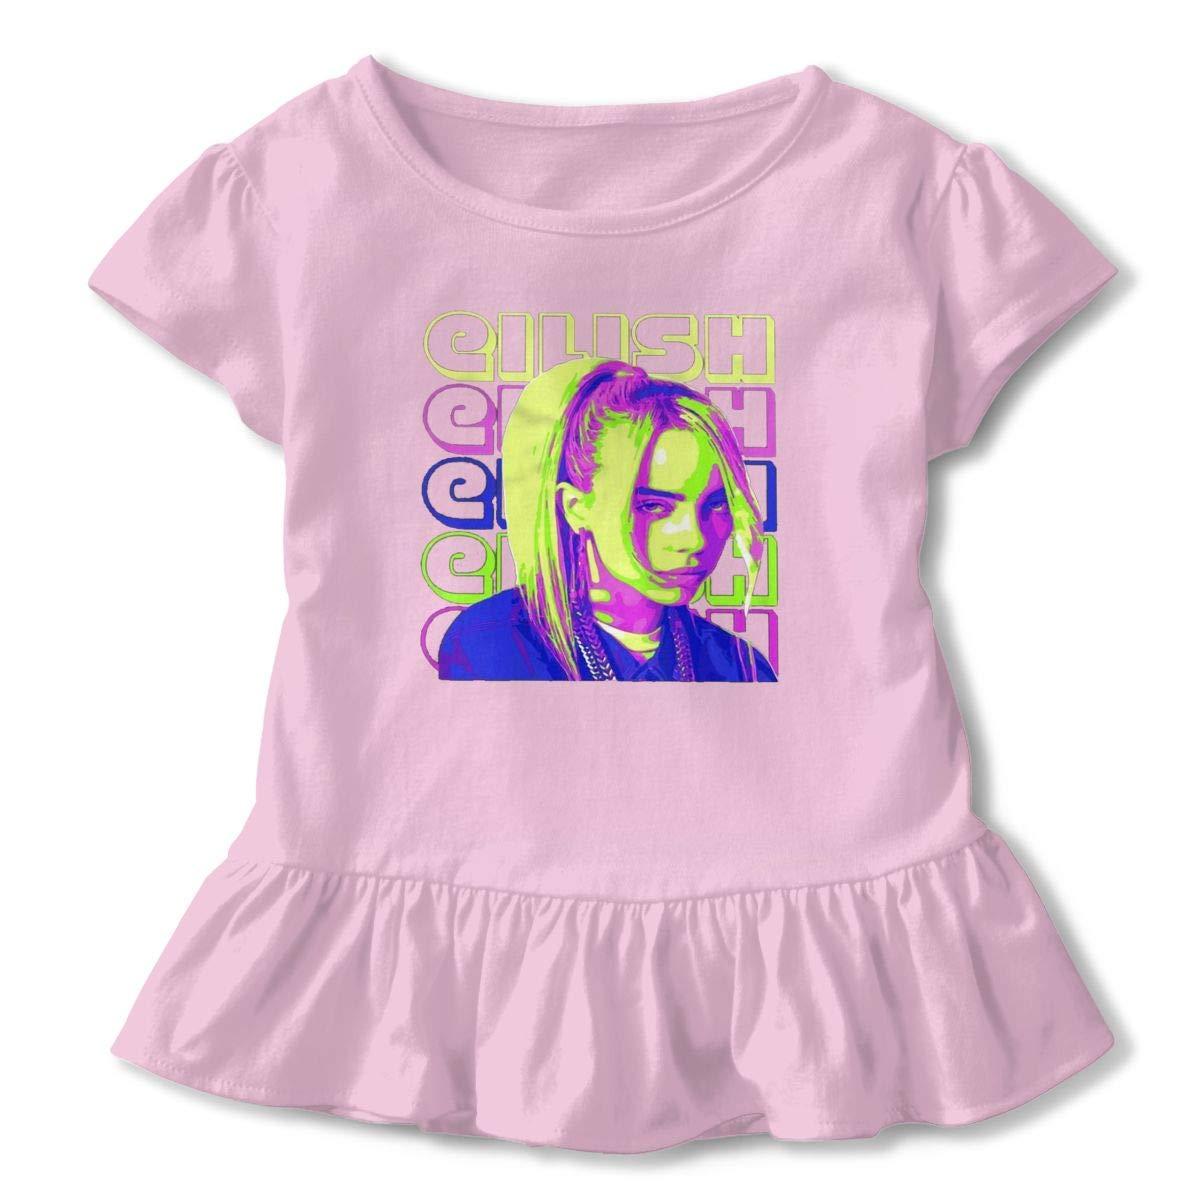 e9322835 Amazon.com: Billie-Eilish Lovers Baby Girls Short Sleeve T-Shirt for Kids  Tee Soft Cotton Shirt Cute Pink Princess Sweetheart: Clothing